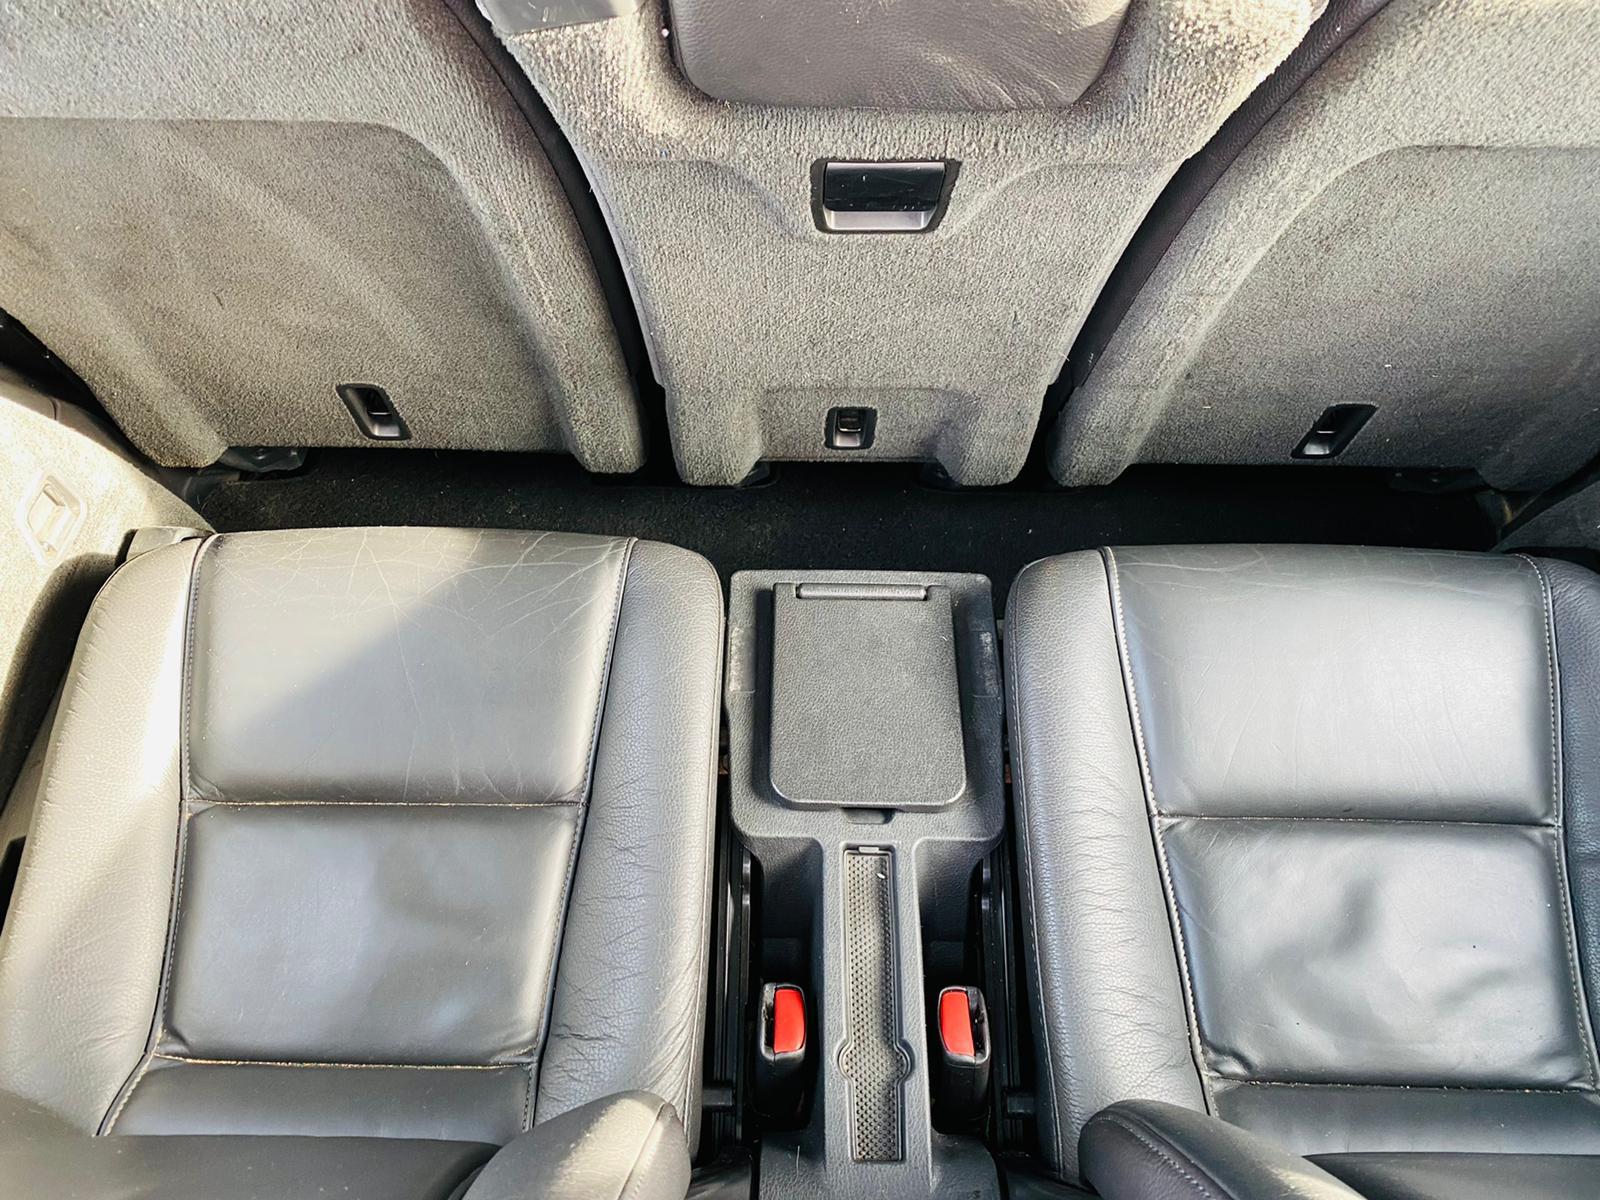 Volvo XC90 2.4 D5 185bhp SE Geartronic Auto 2006 06 Reg - 7 Seats - Air con - Top Spec - Image 44 of 47